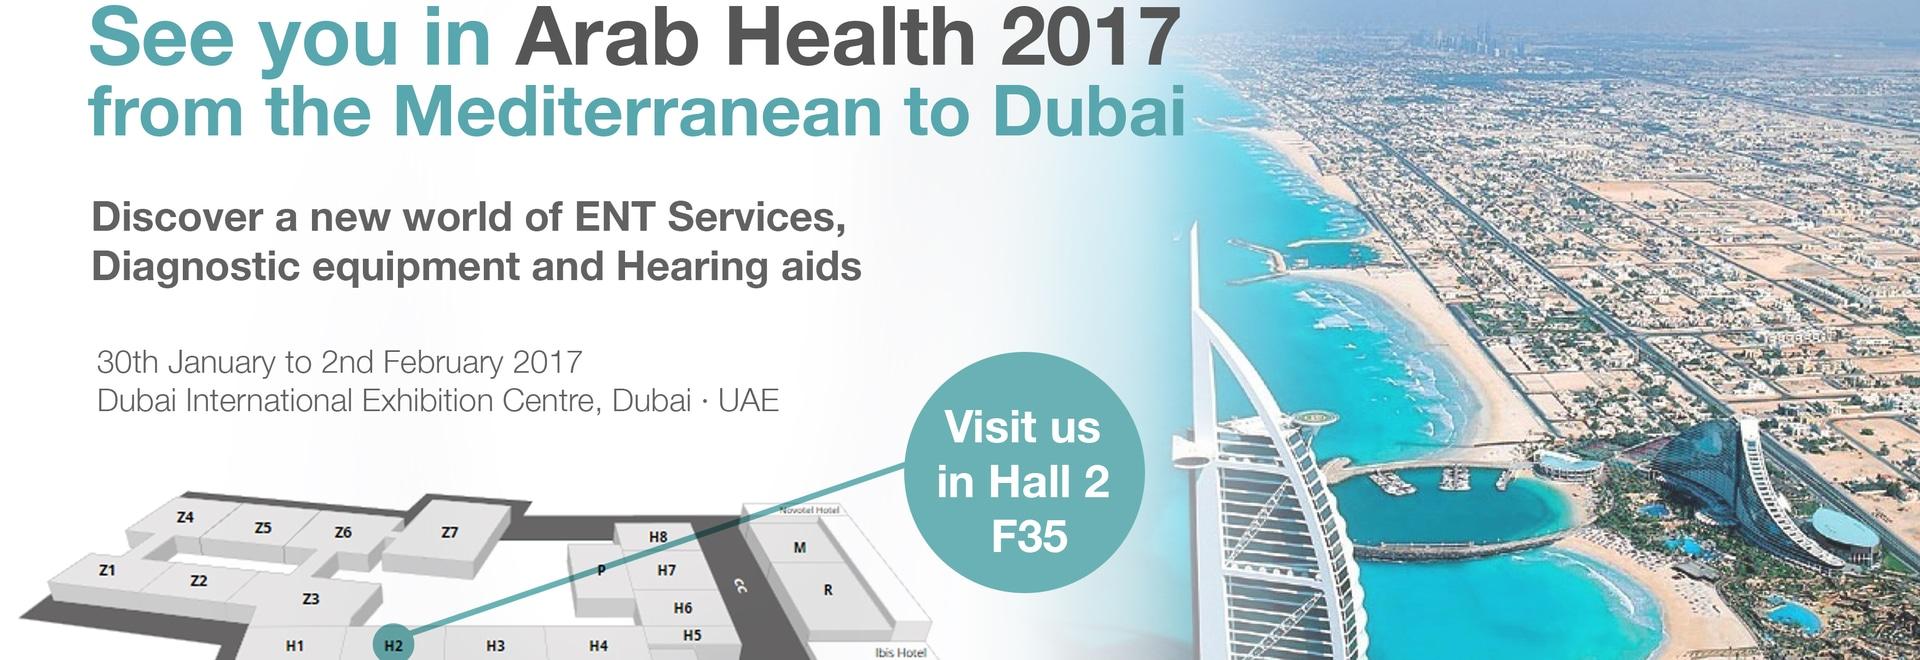 Invitation arab health dubai international convention exhibition invitation arab health dubai international convention exhibition centre 2017 stopboris Gallery